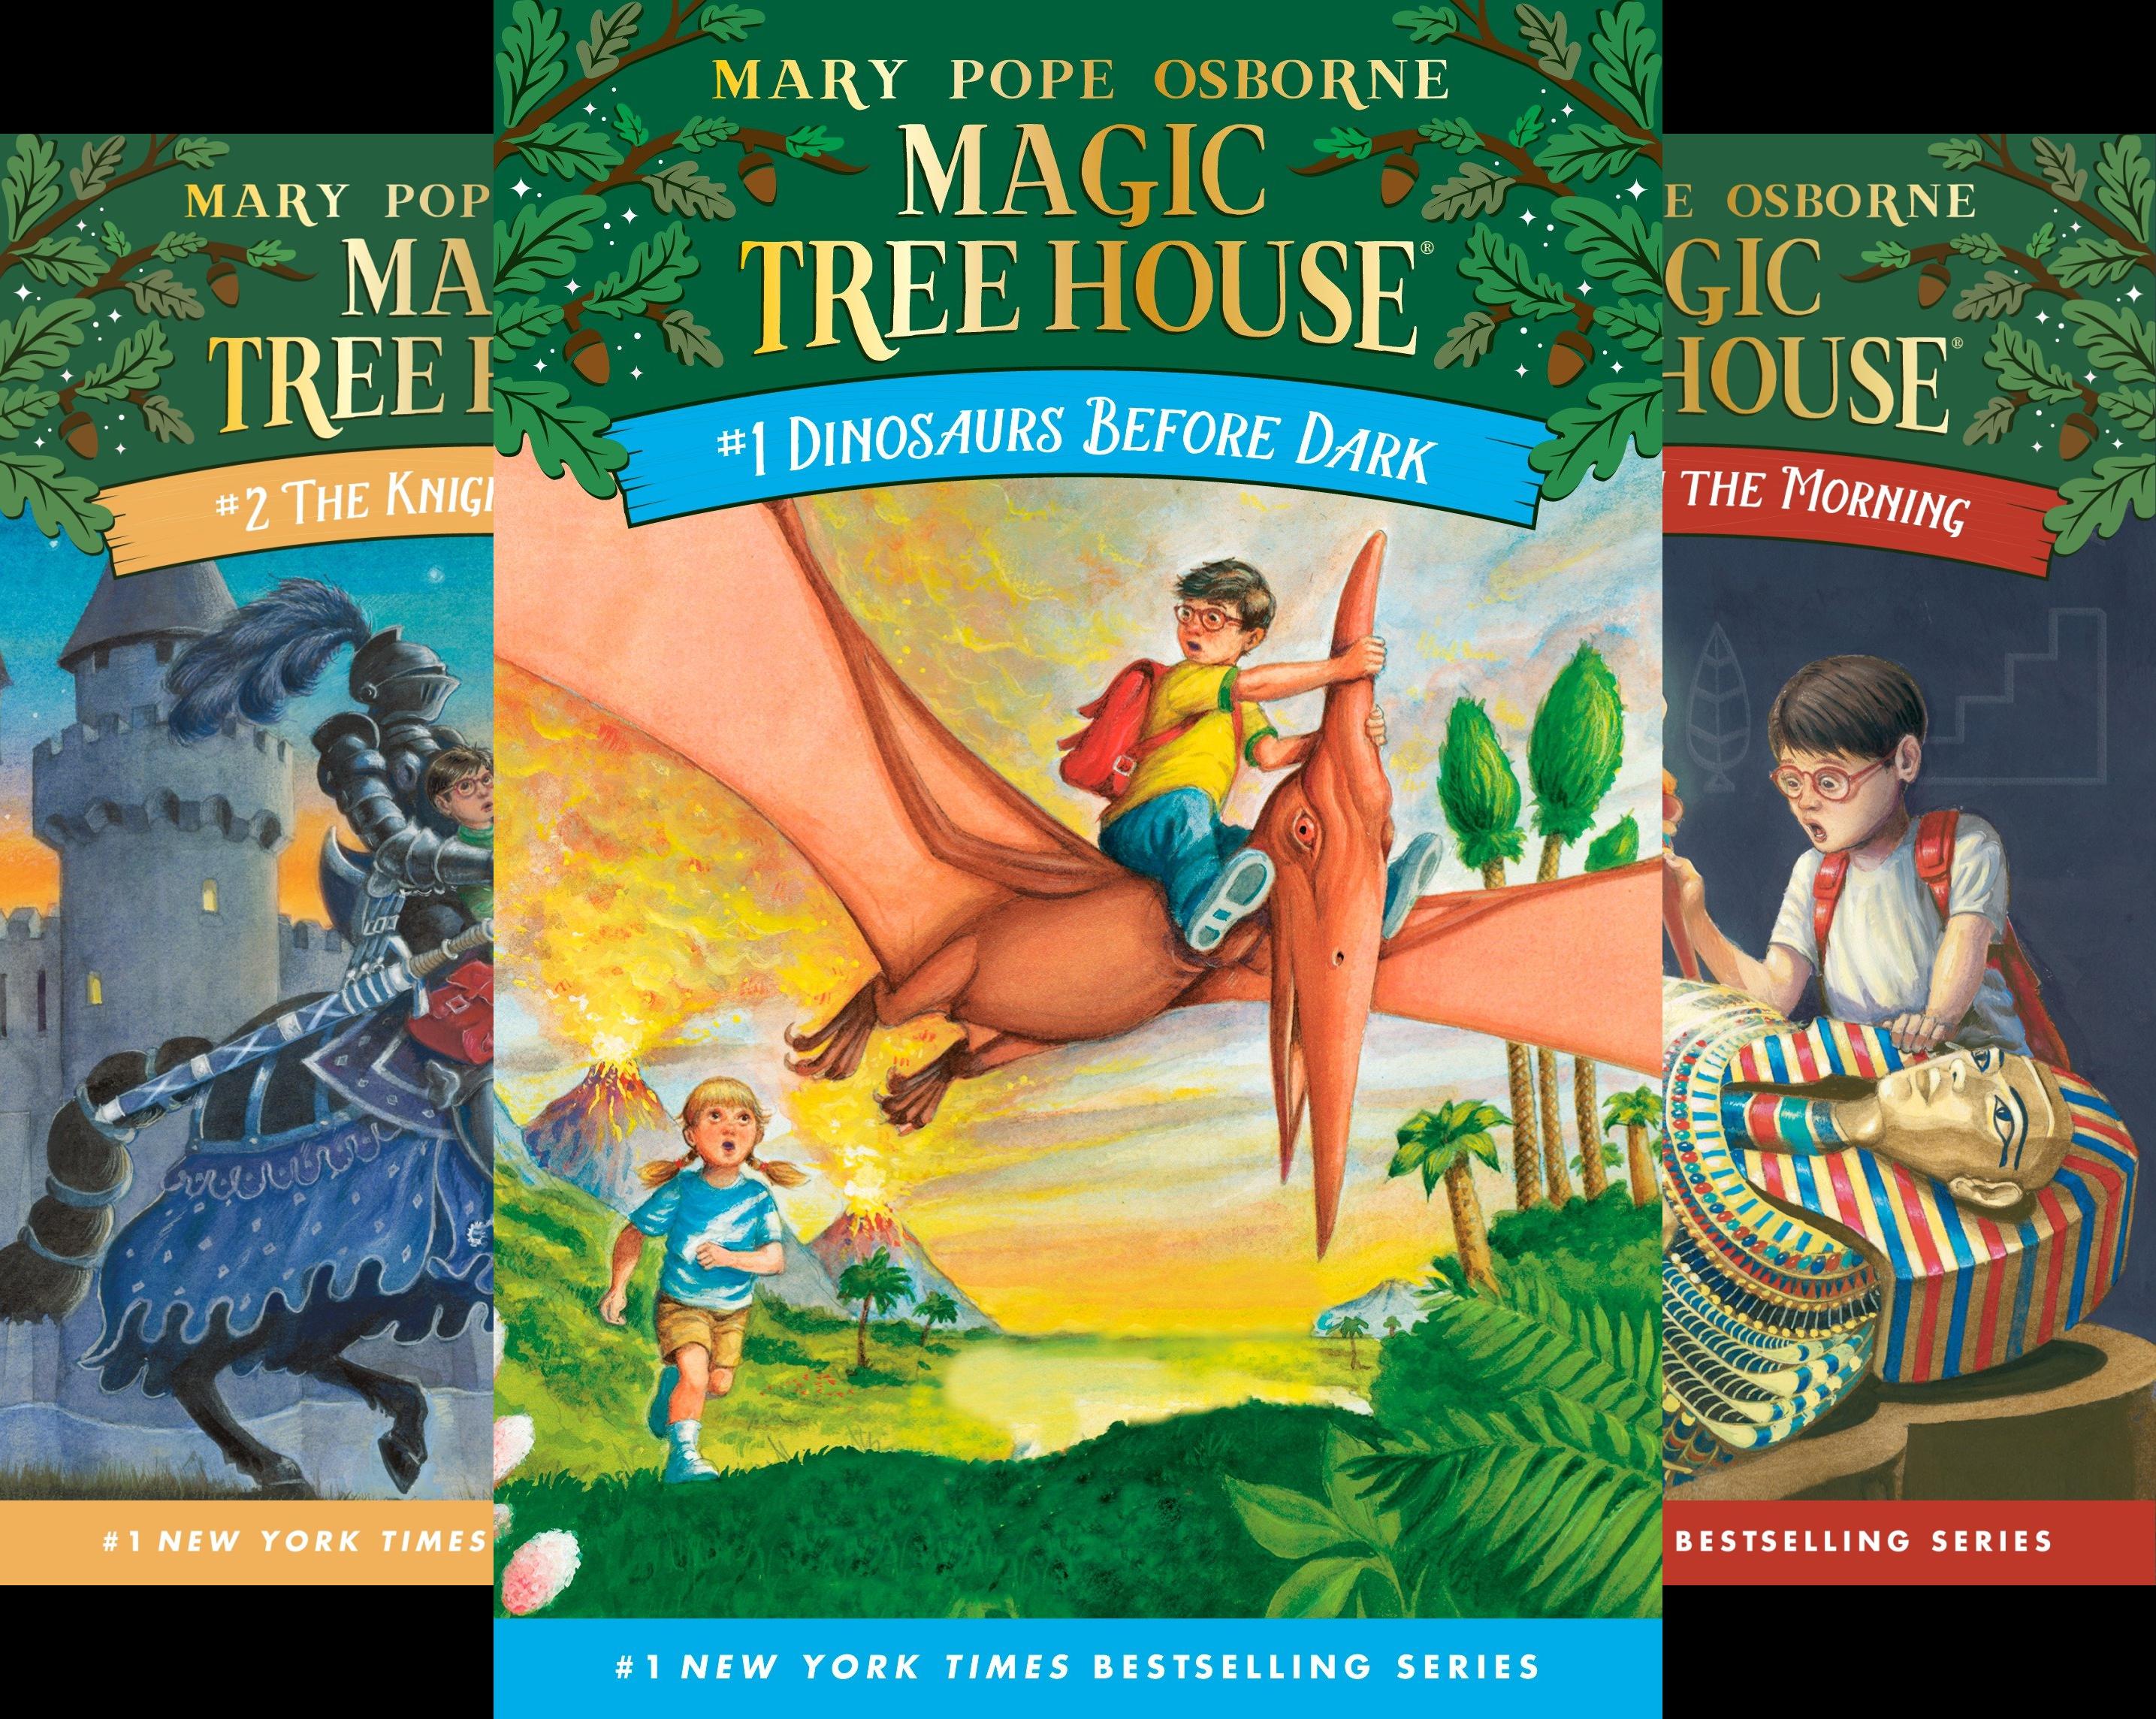 Magic Tree House Boxed Set, Books 1-28 (28 Book Series)